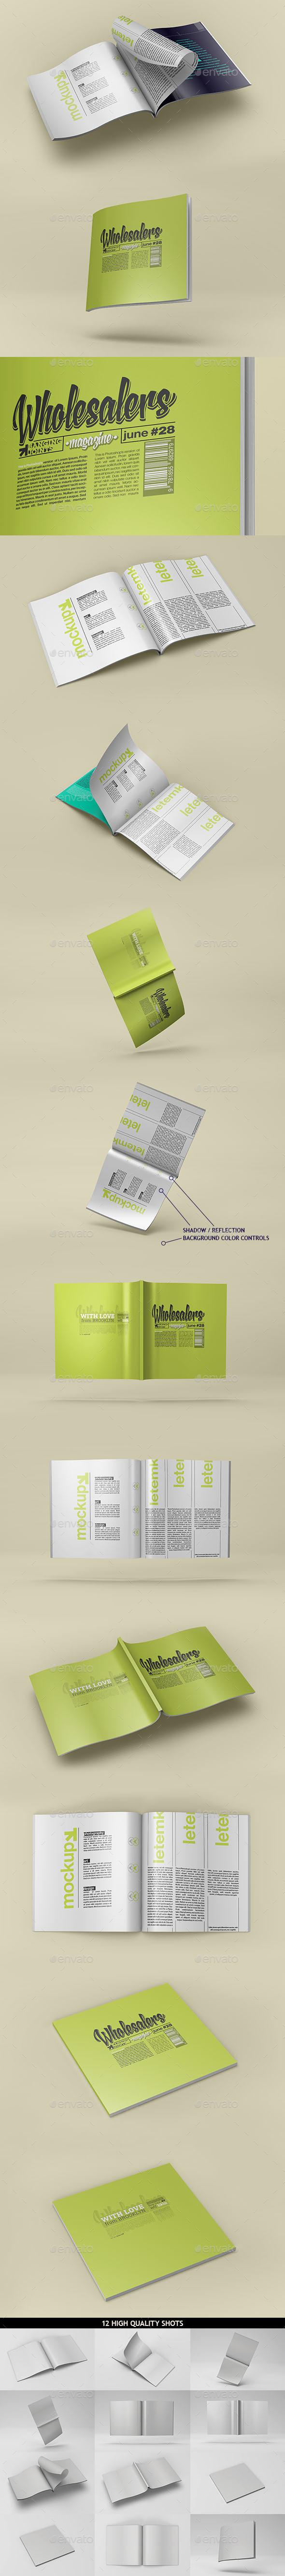 GraphicRiver Square Magazine Catalog Mockup 10636025